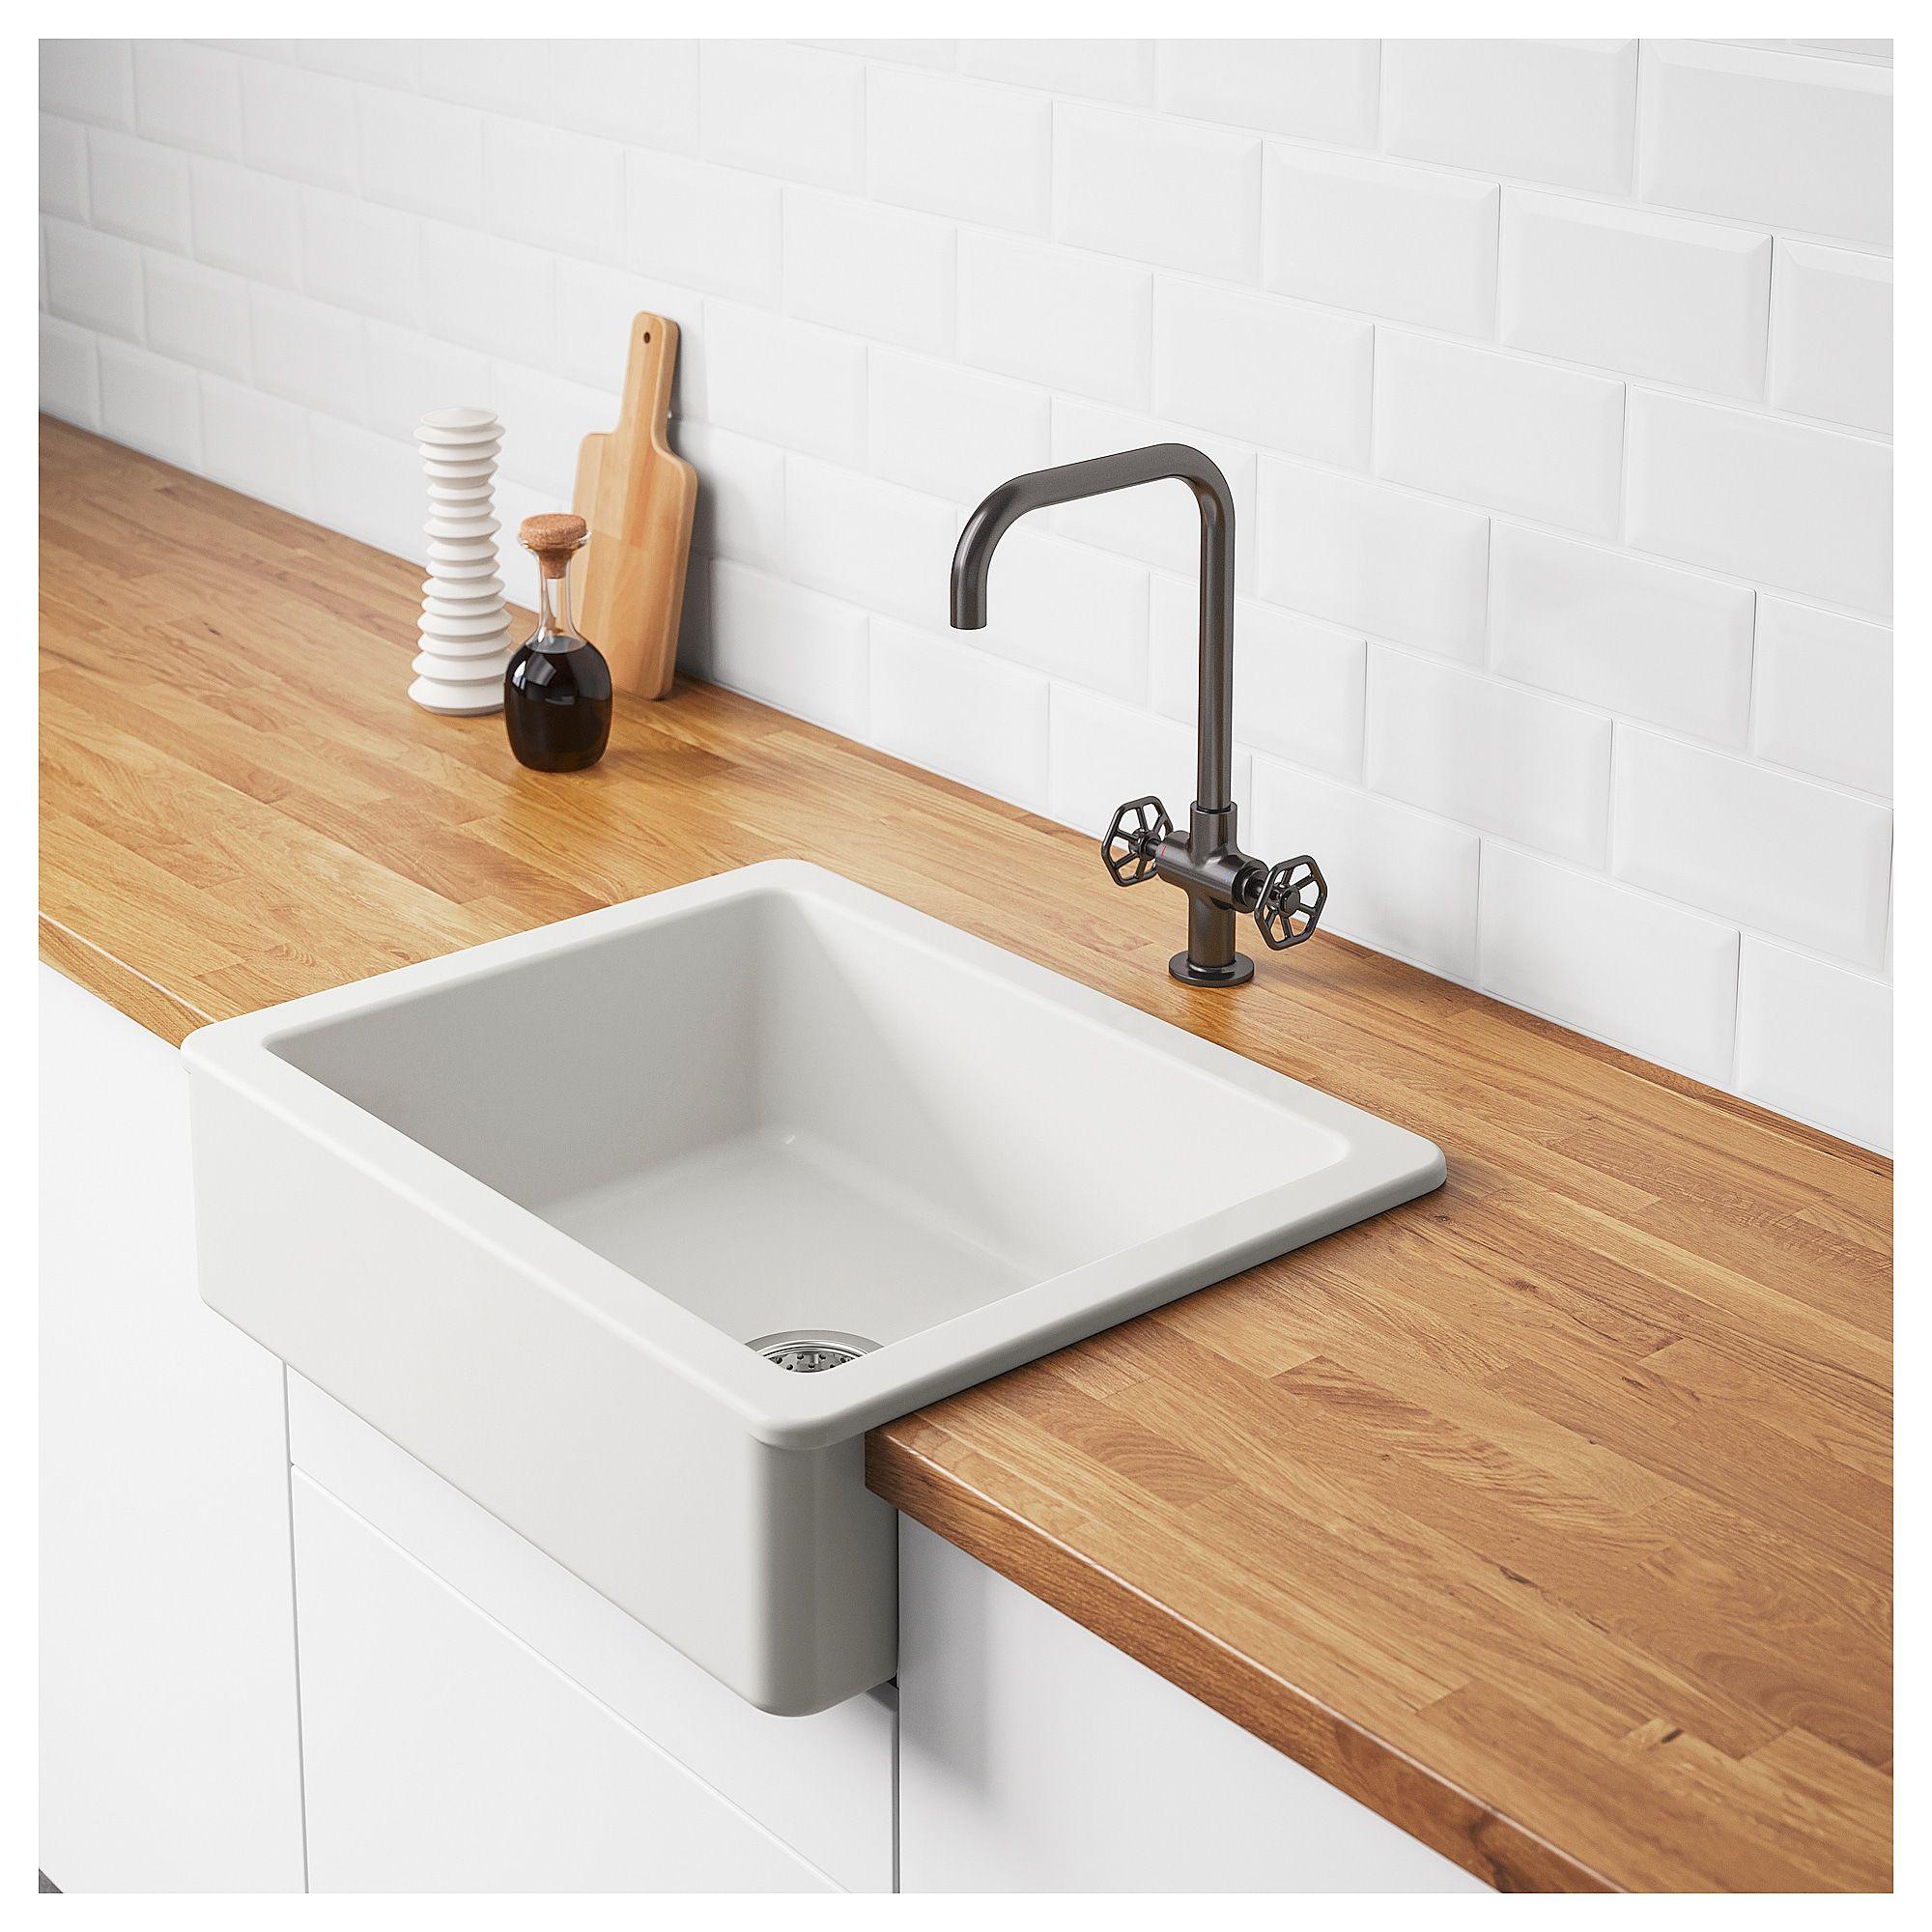 "HAVSEN Apron front sink white 25x19 "" Ikea sinks"